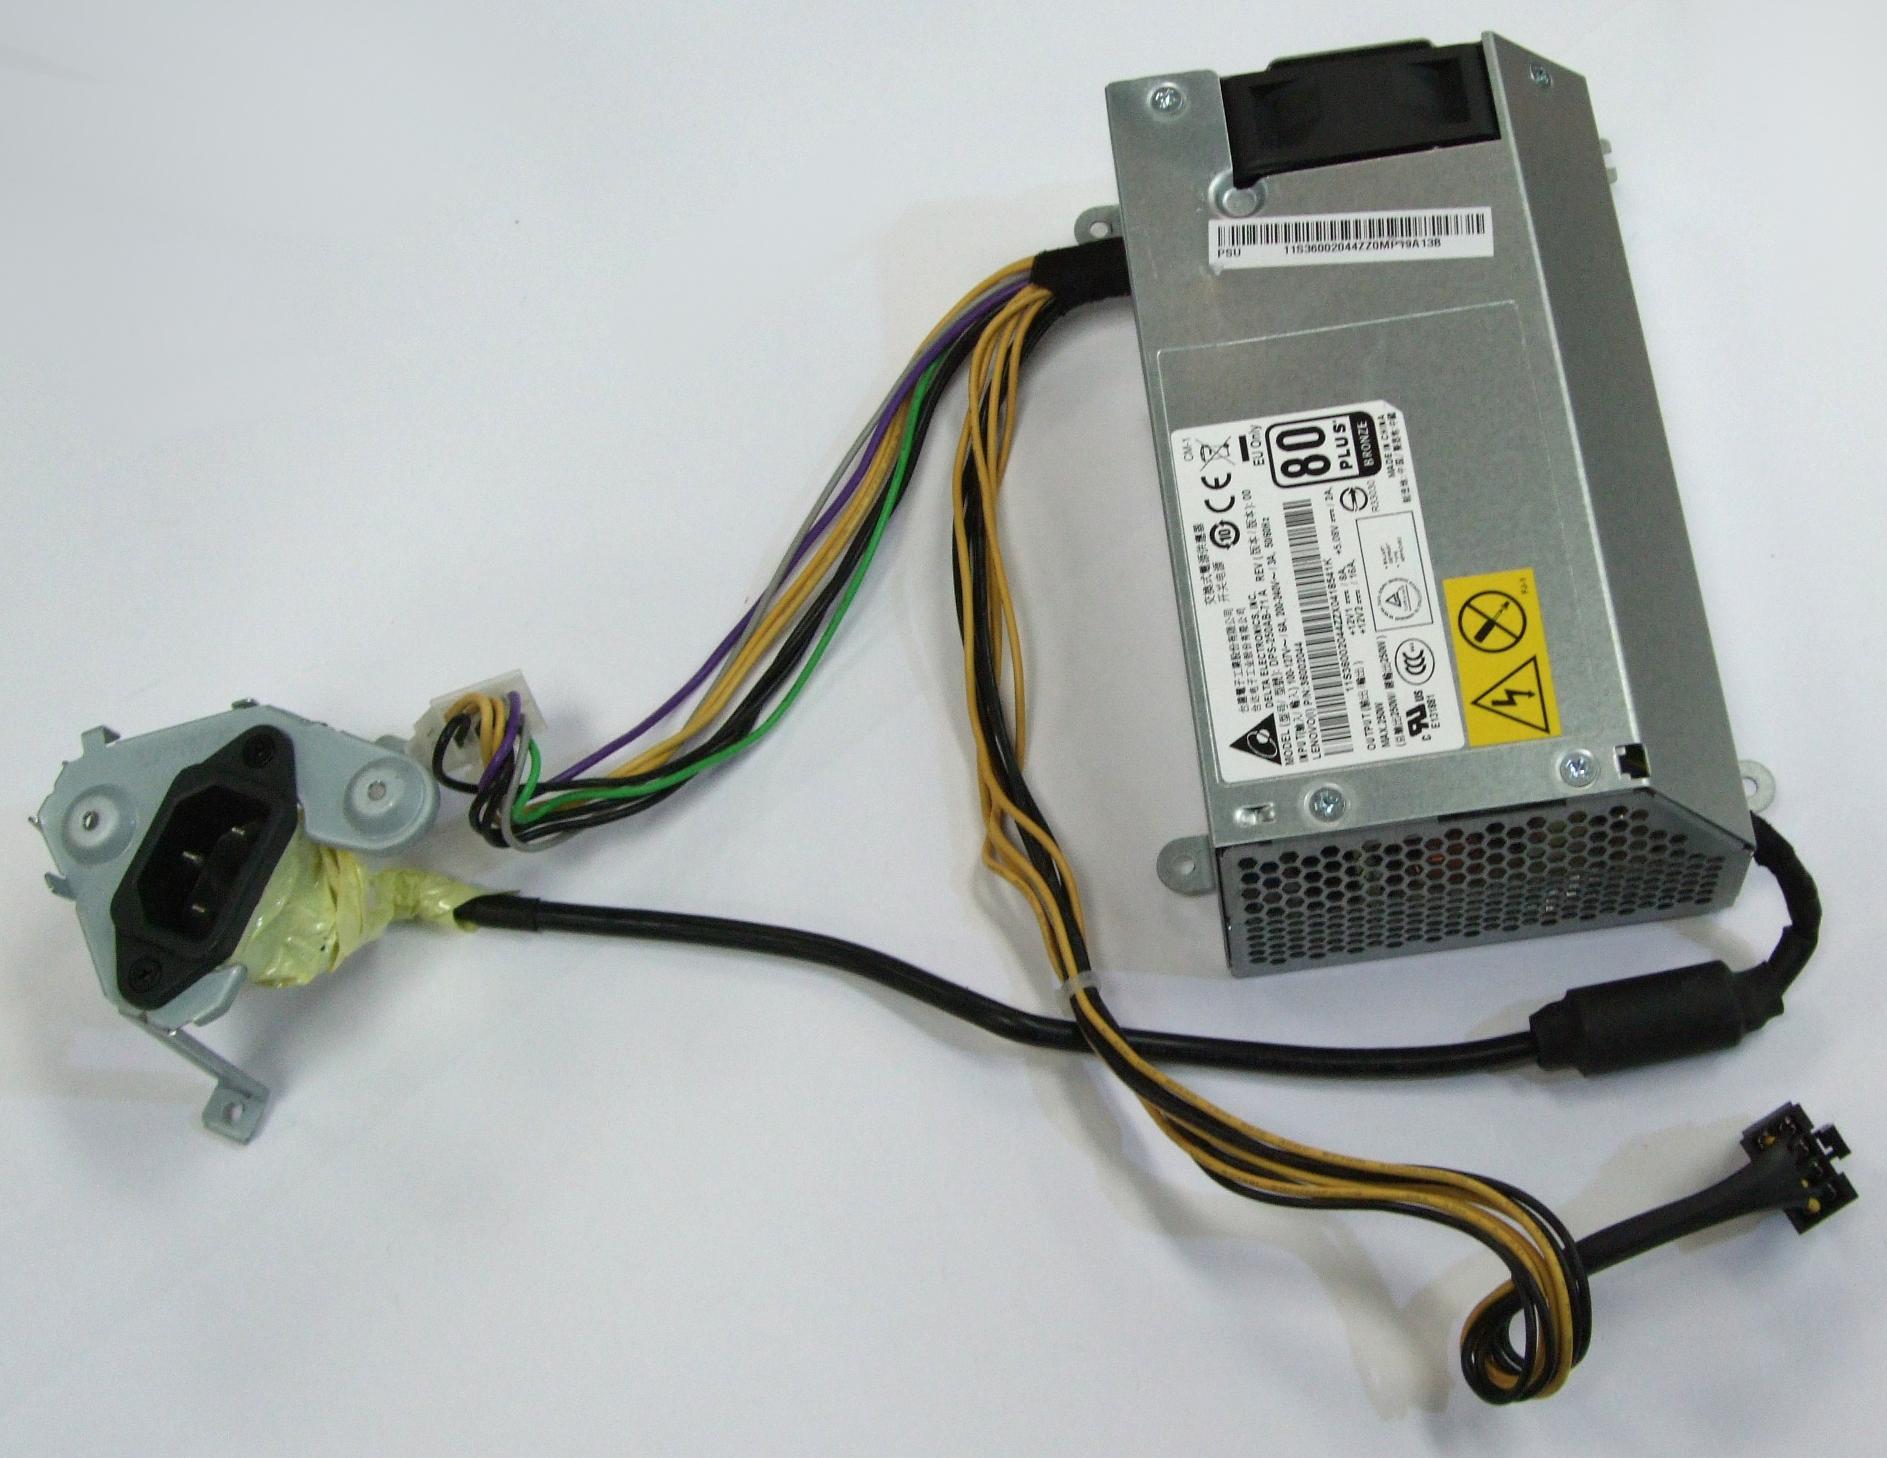 36002044 Lenovo 250W Power Supply - Delta Electronics DPS-250AB-71 A